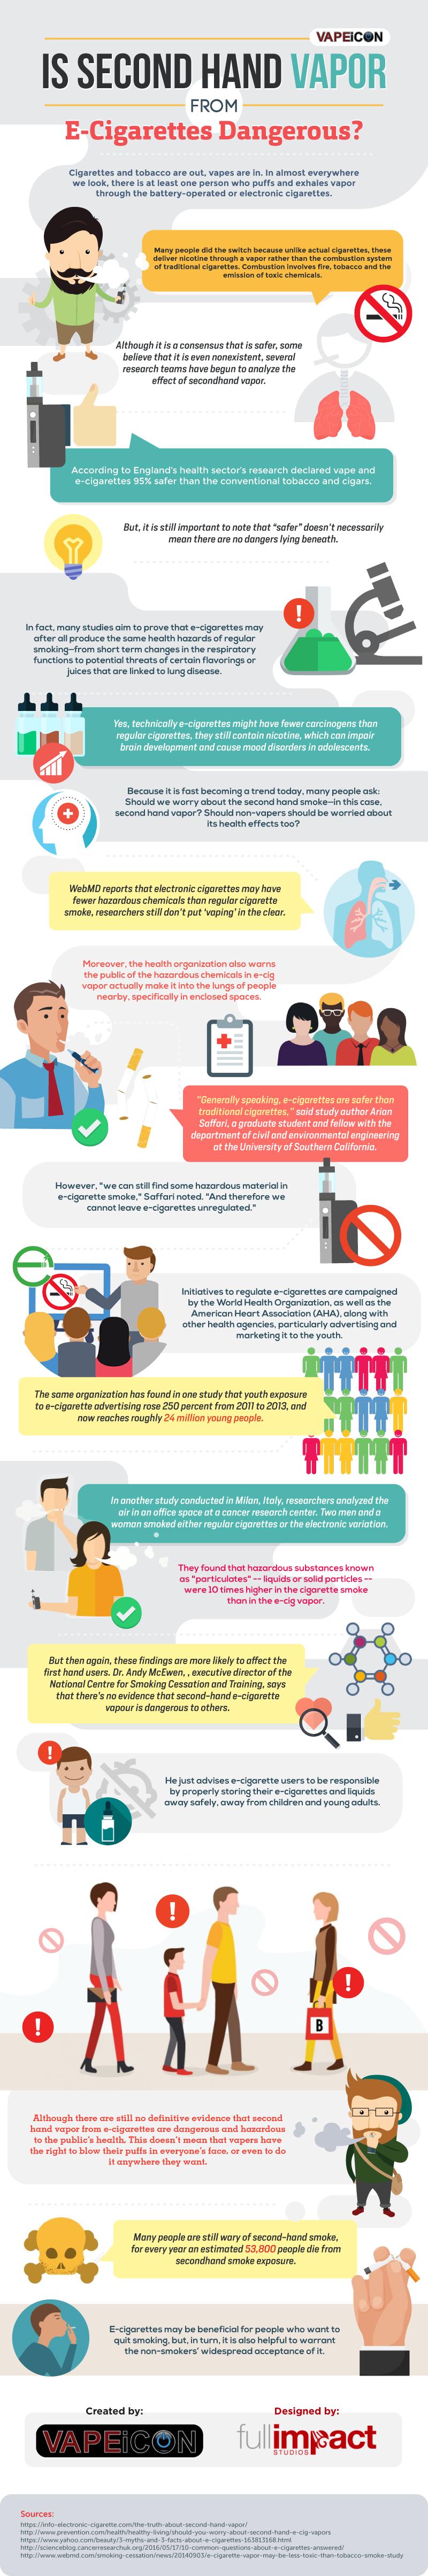 Is Second Hand Vapor From E Cigarettes Dangerous